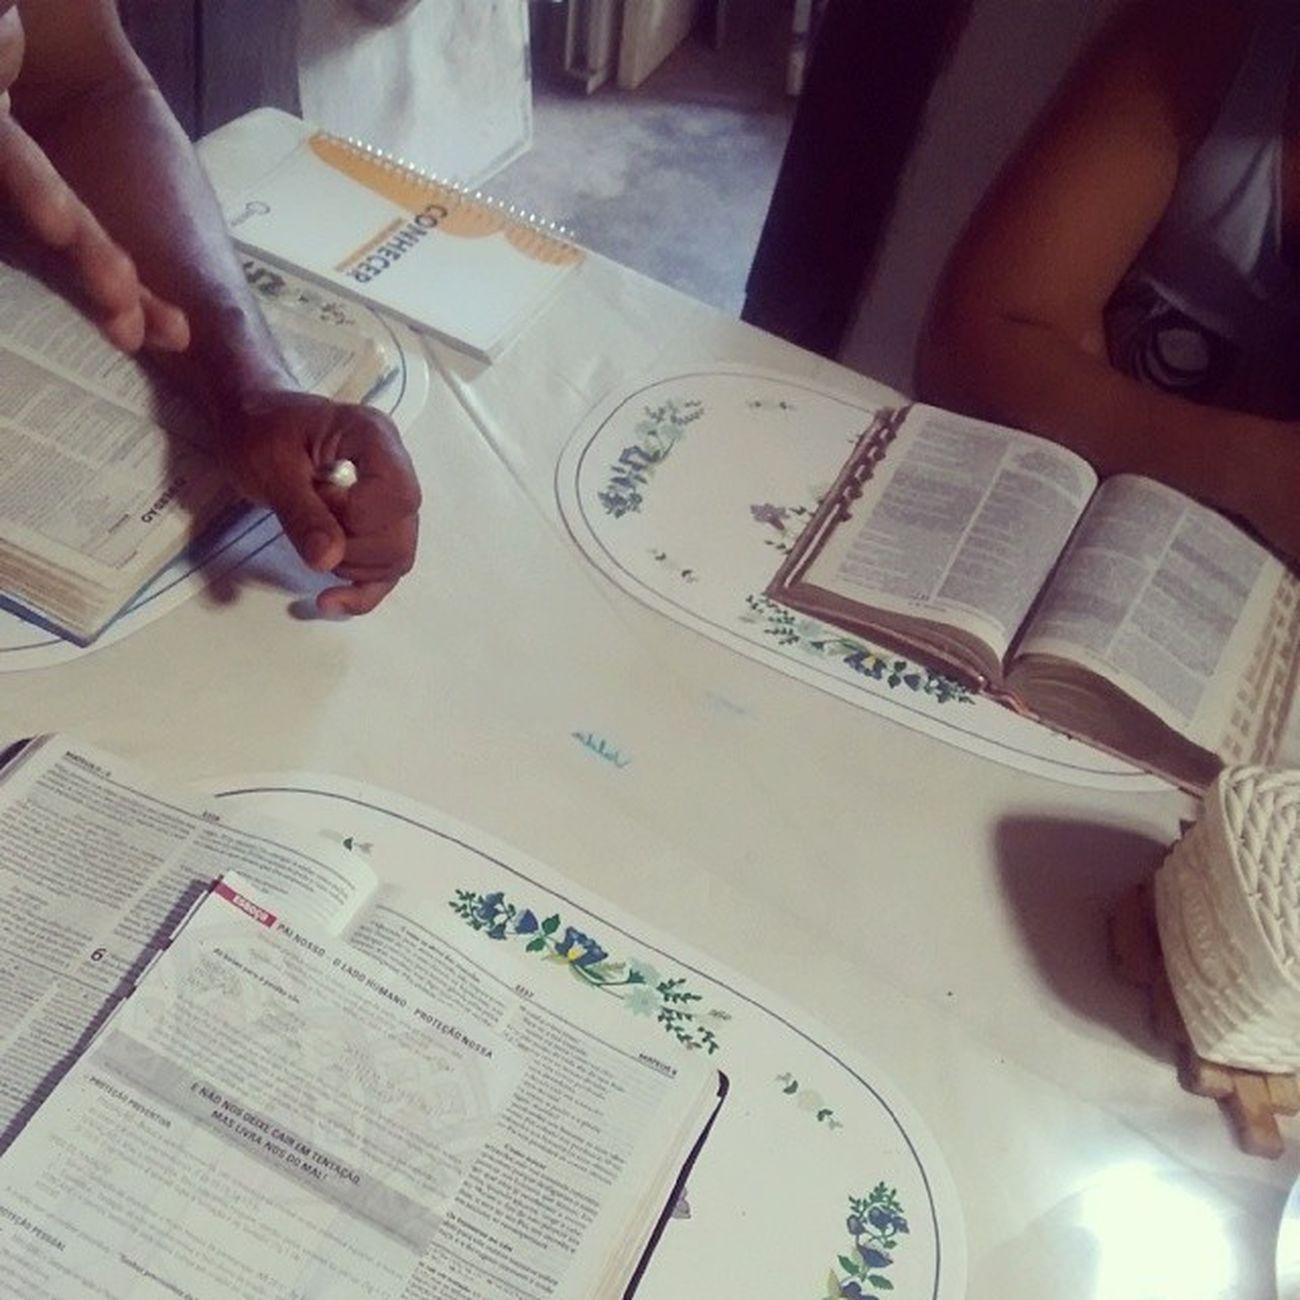 Meditação em família. GodisMyLord Godislove GodFirst IAMSECOND Worship